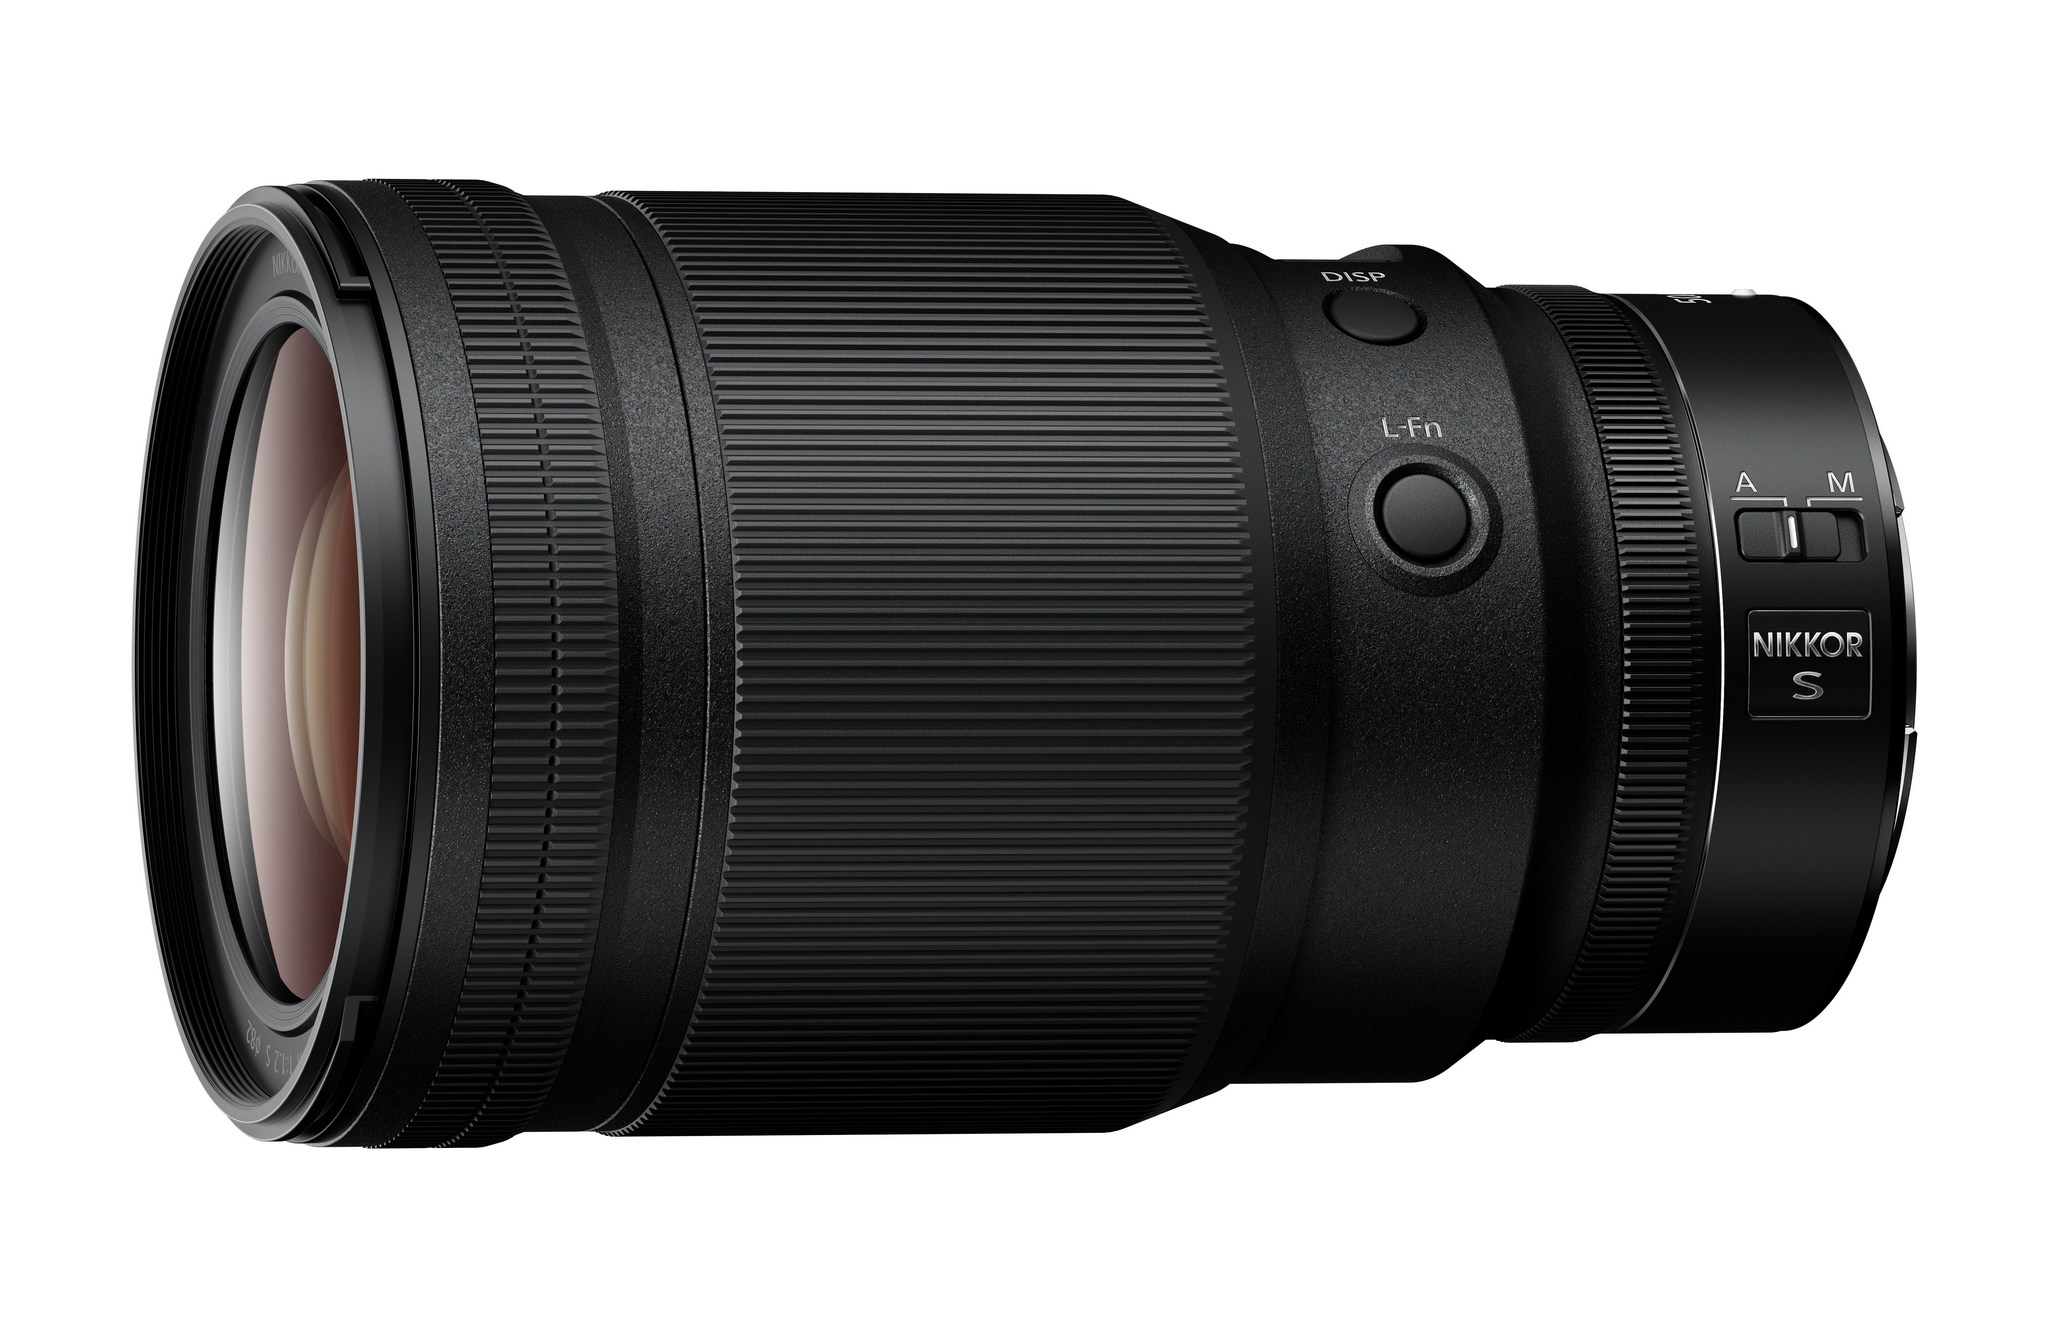 NIKKOR Z 50 mm f/1,2 S